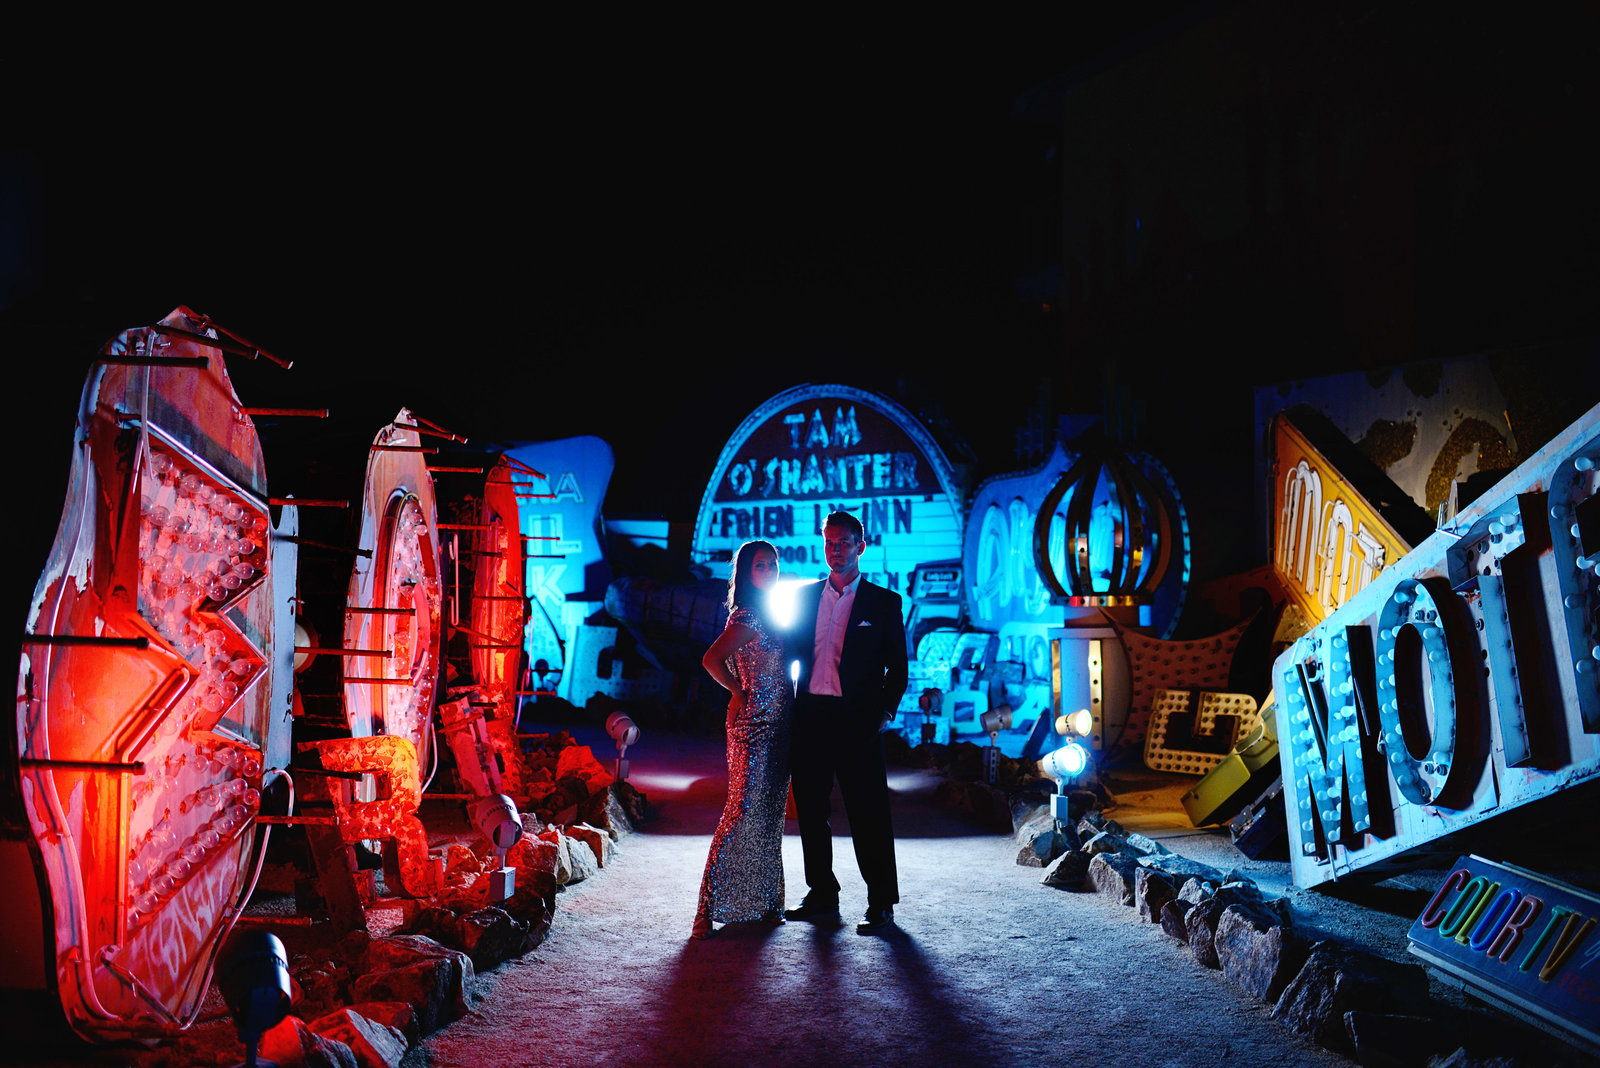 las vegas nevada destination wedding photographer bryan newfield photography 52